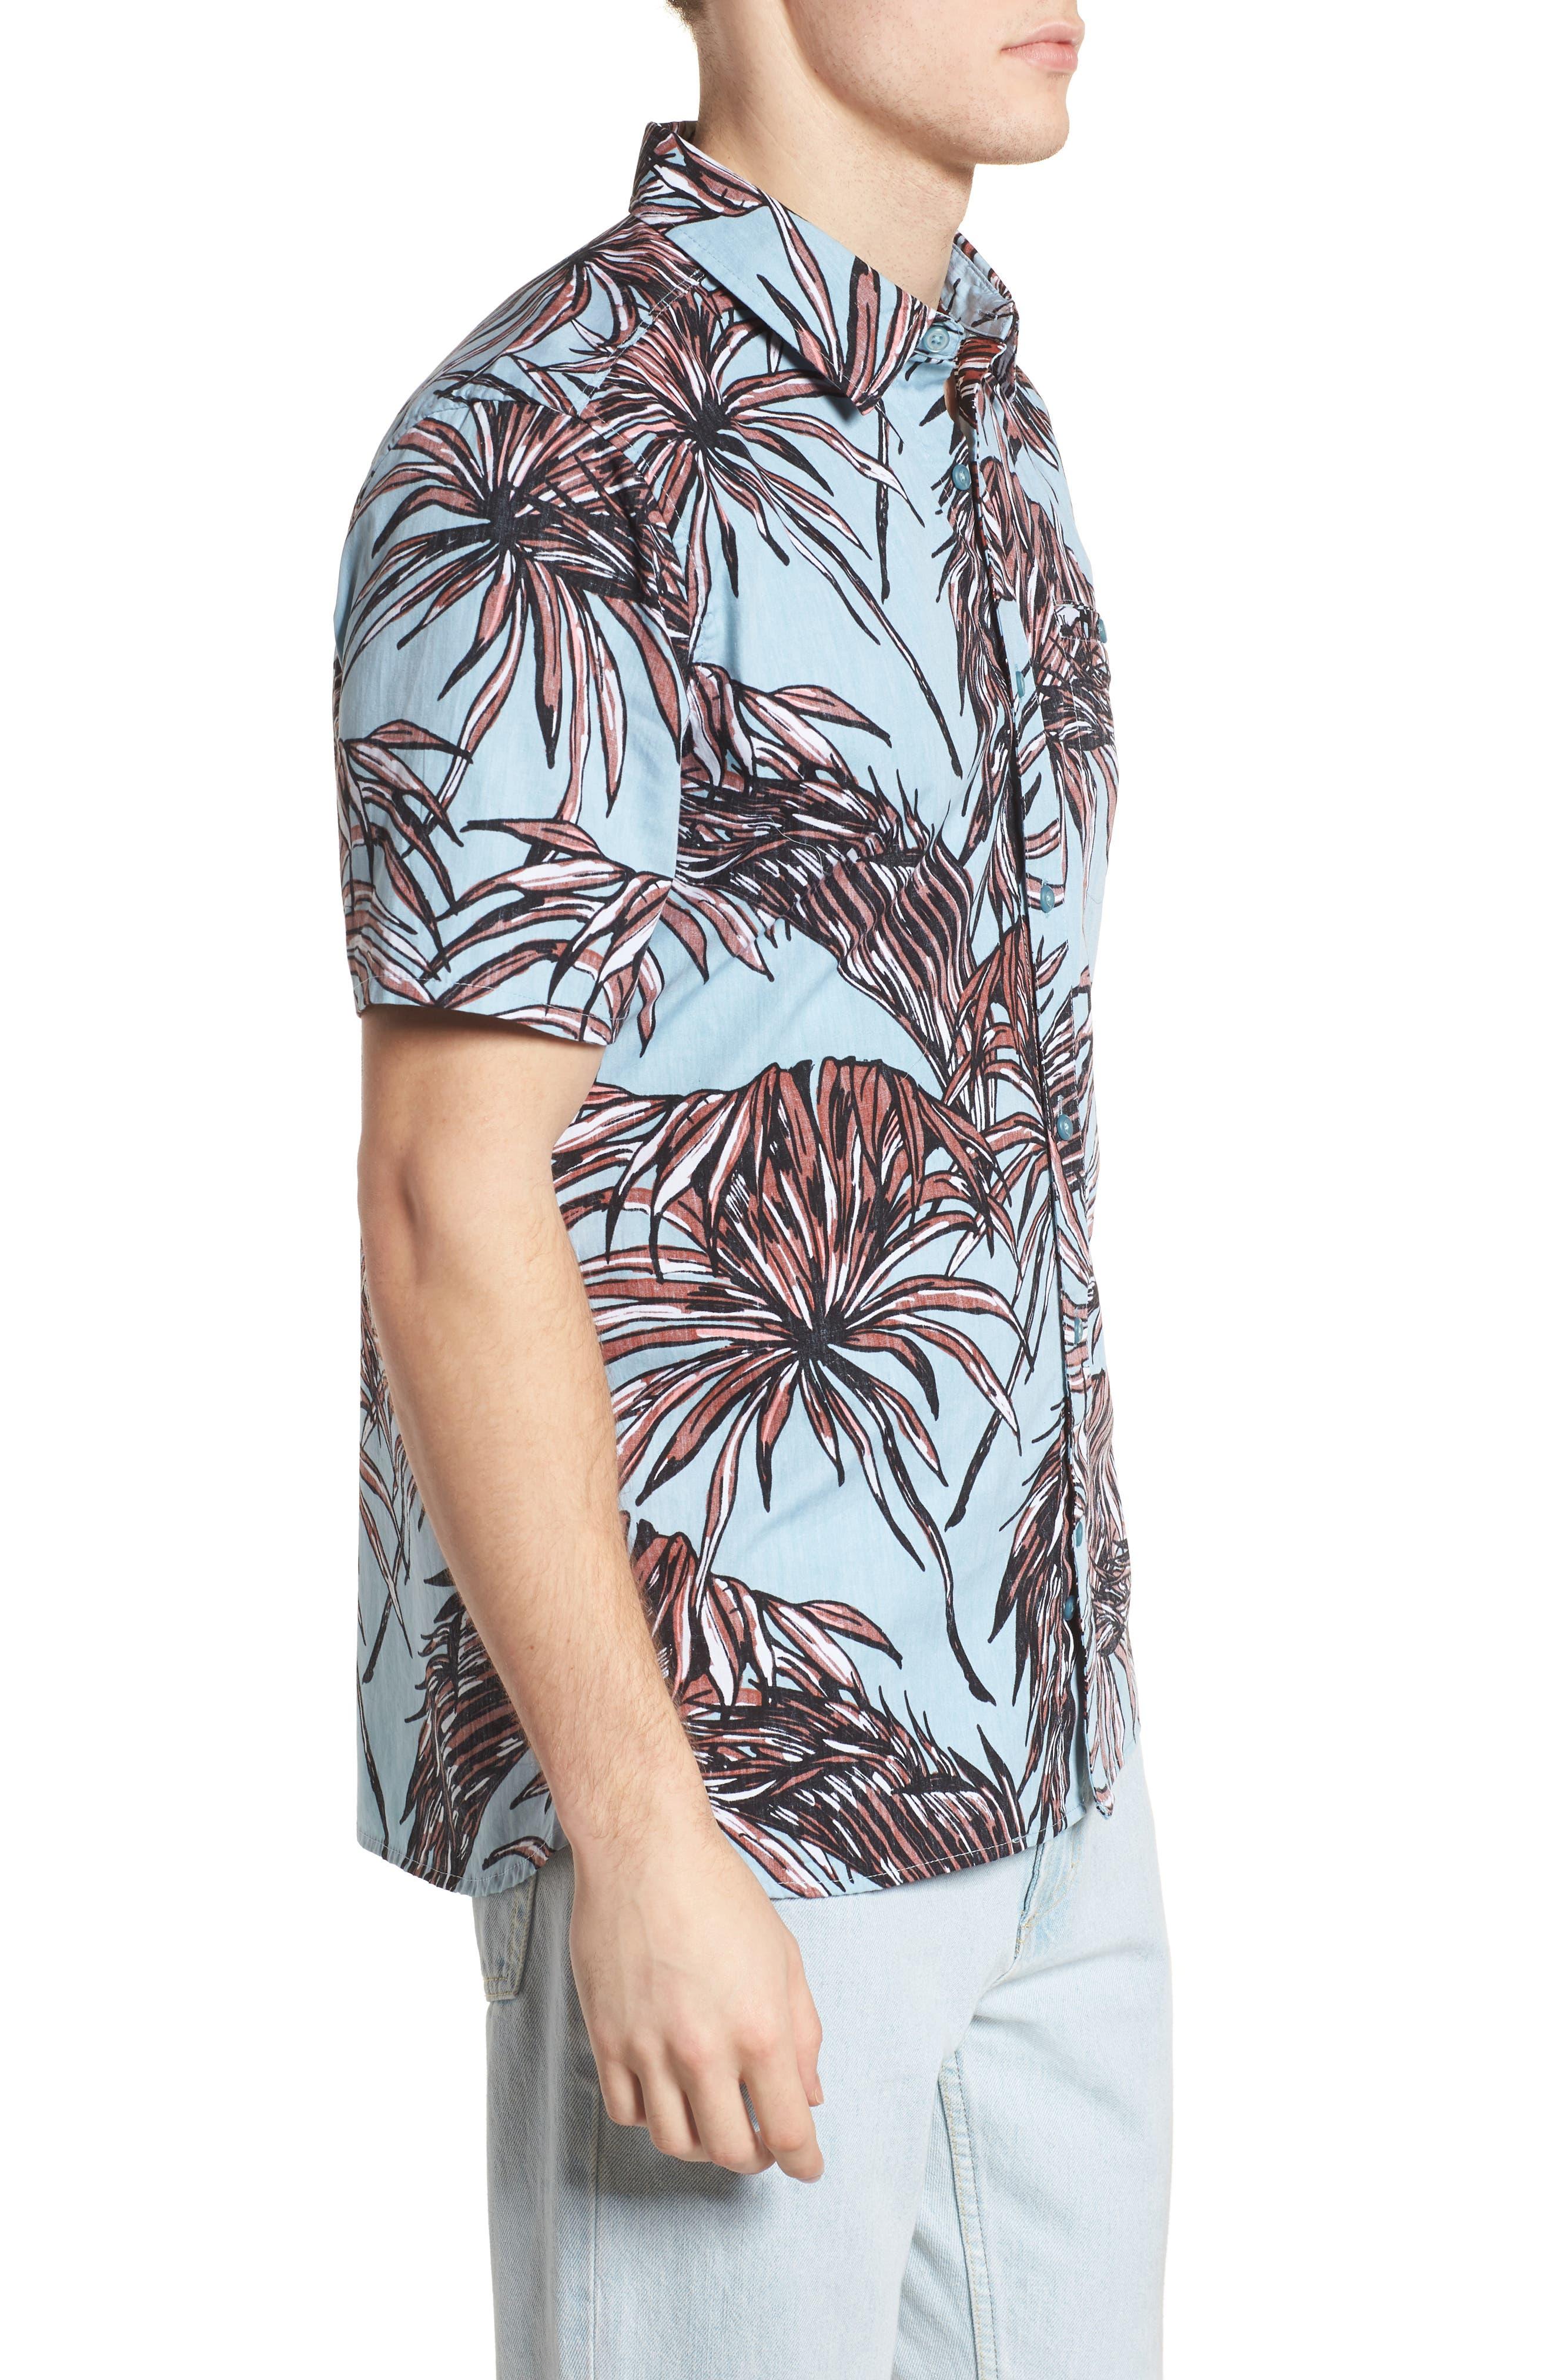 Koko Shirt,                             Alternate thumbnail 4, color,                             Ocean Bliss